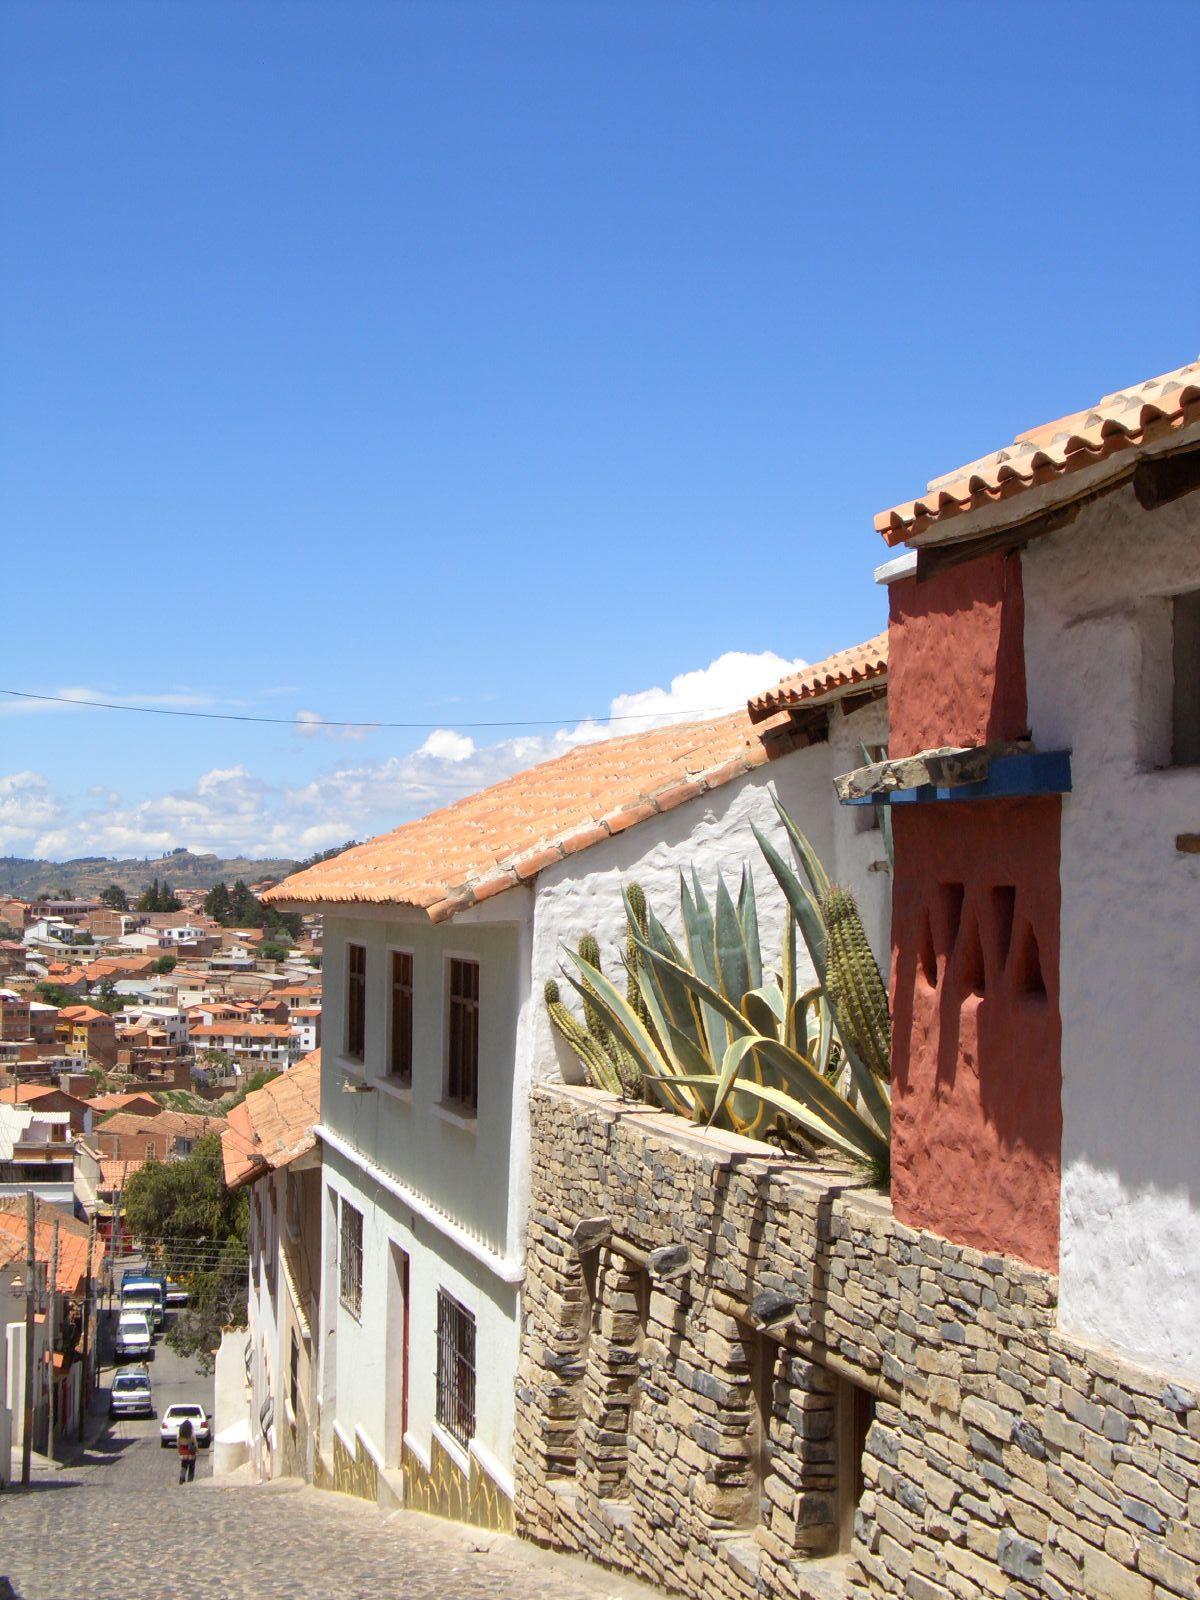 Sucre Bolivia  City pictures : Fil:Bolivia sucre Wikipedia